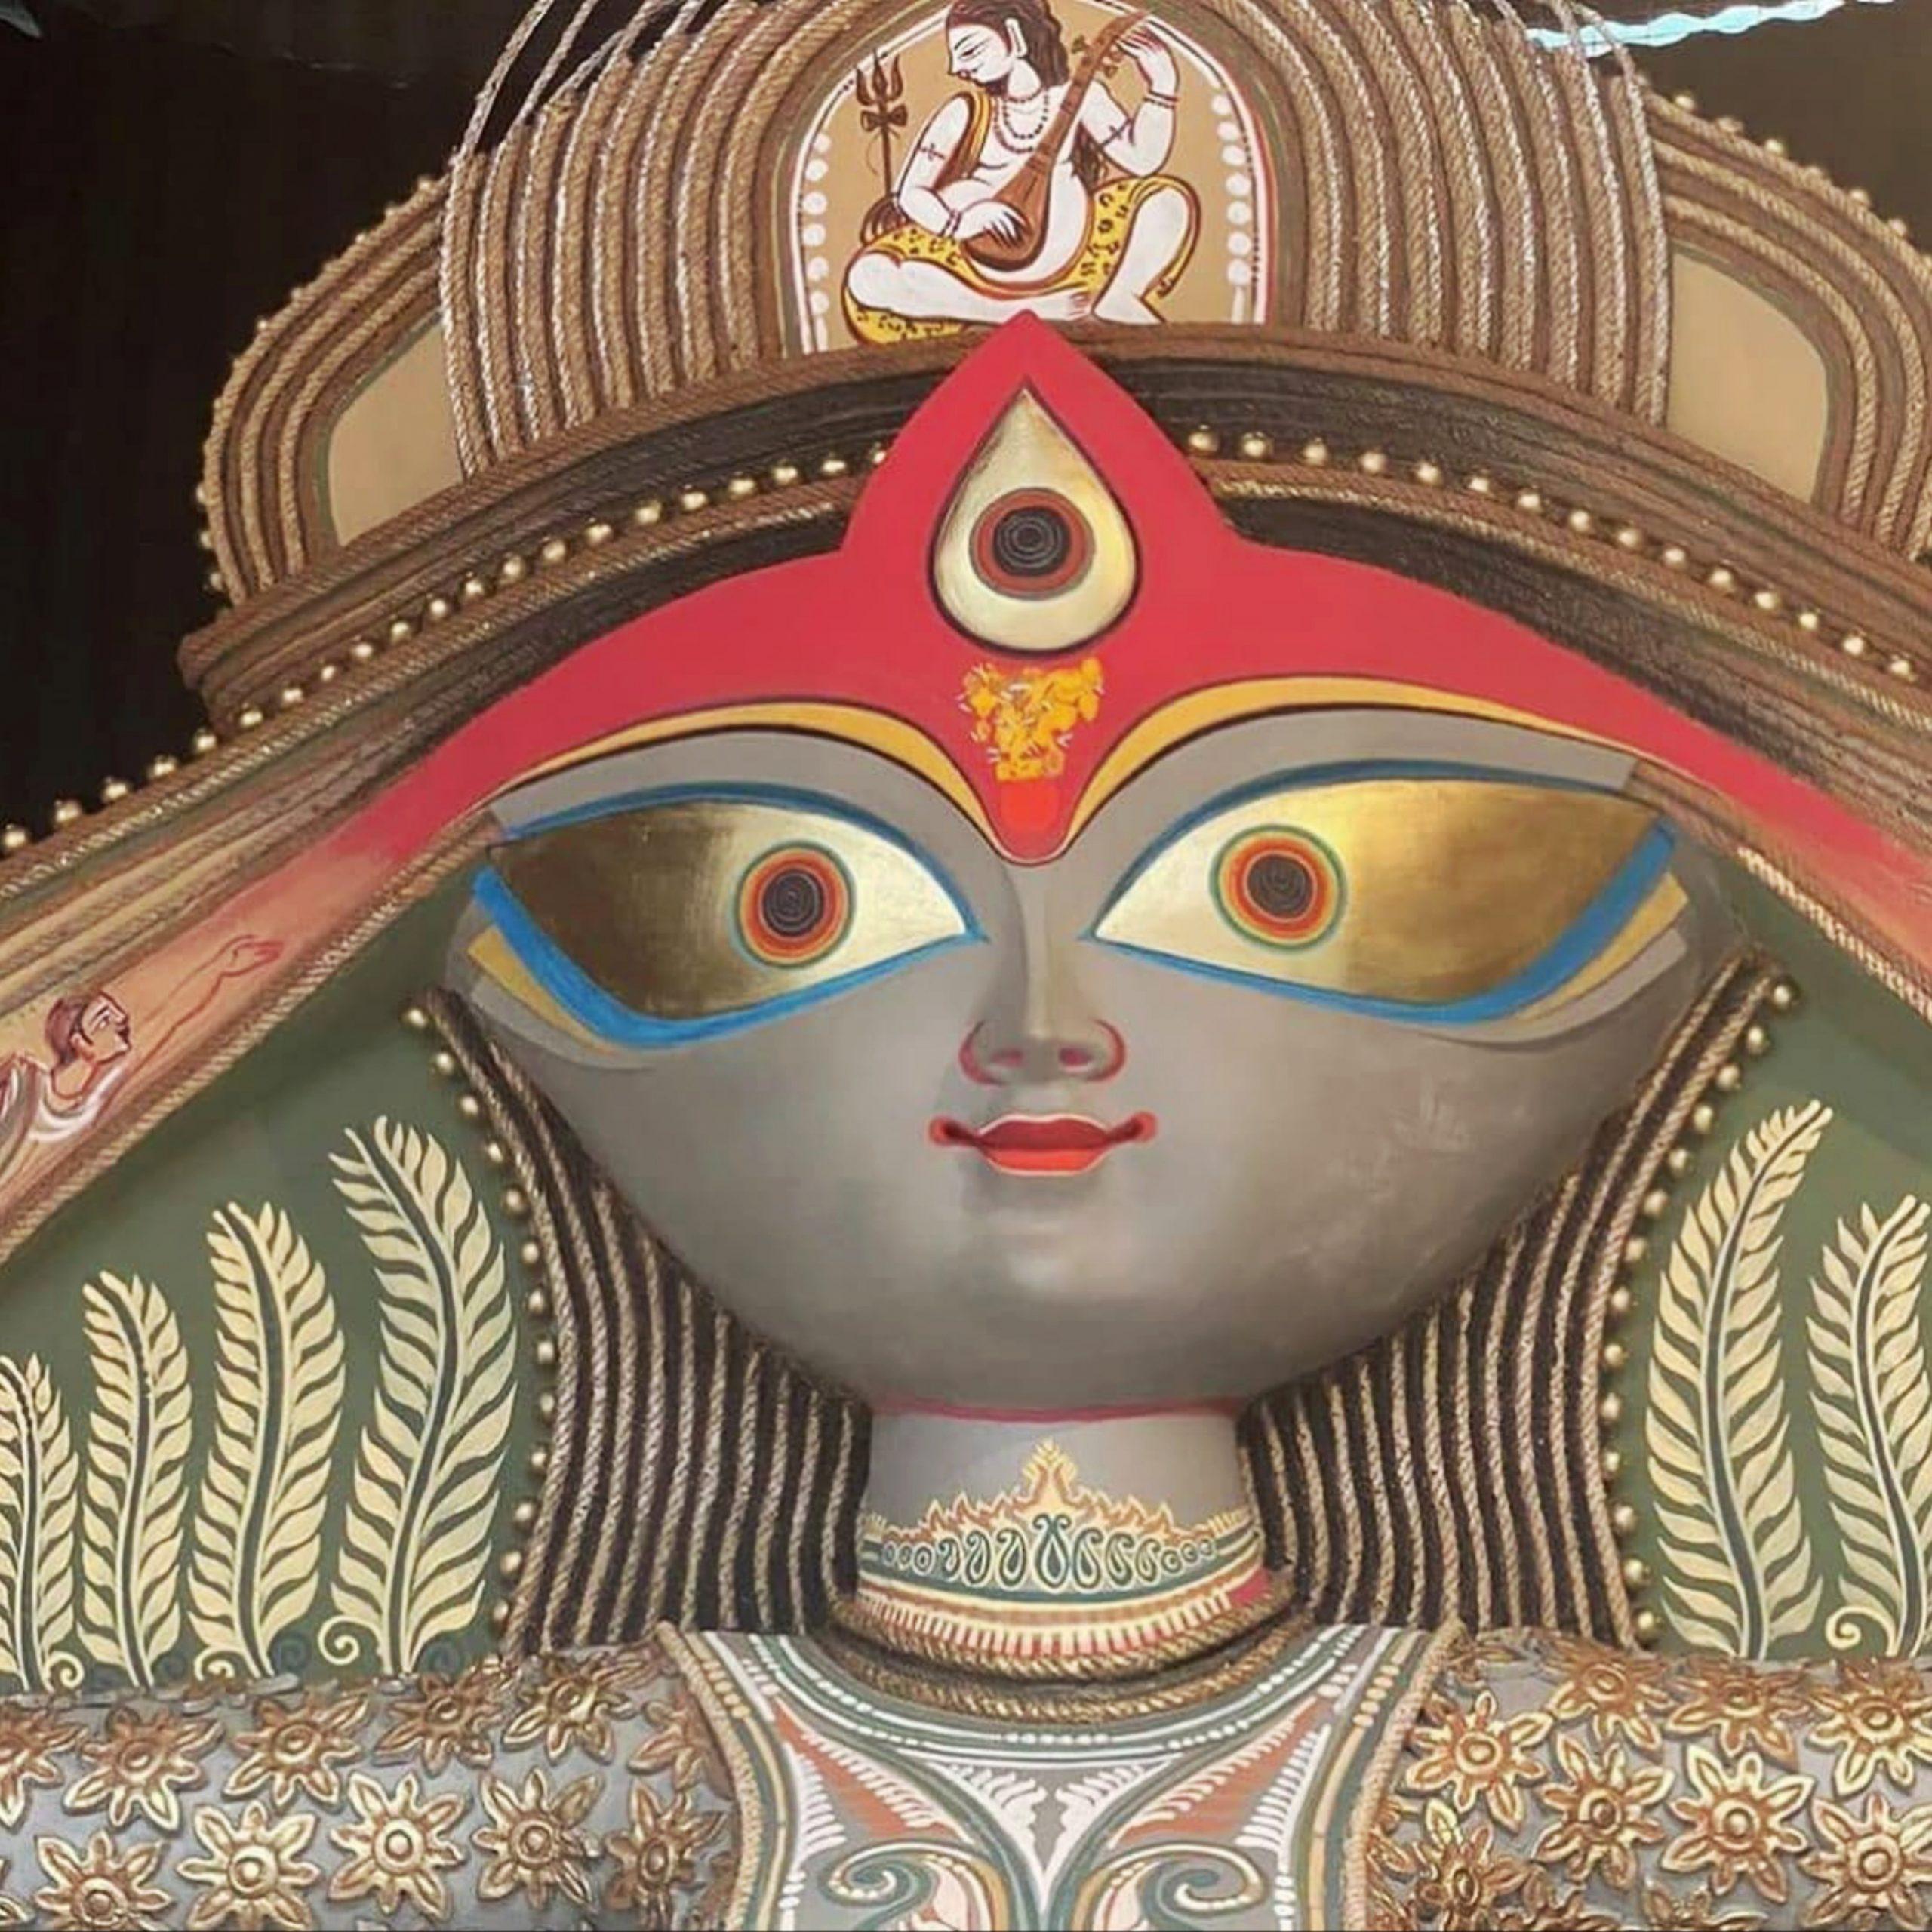 An idol of goddess Durga